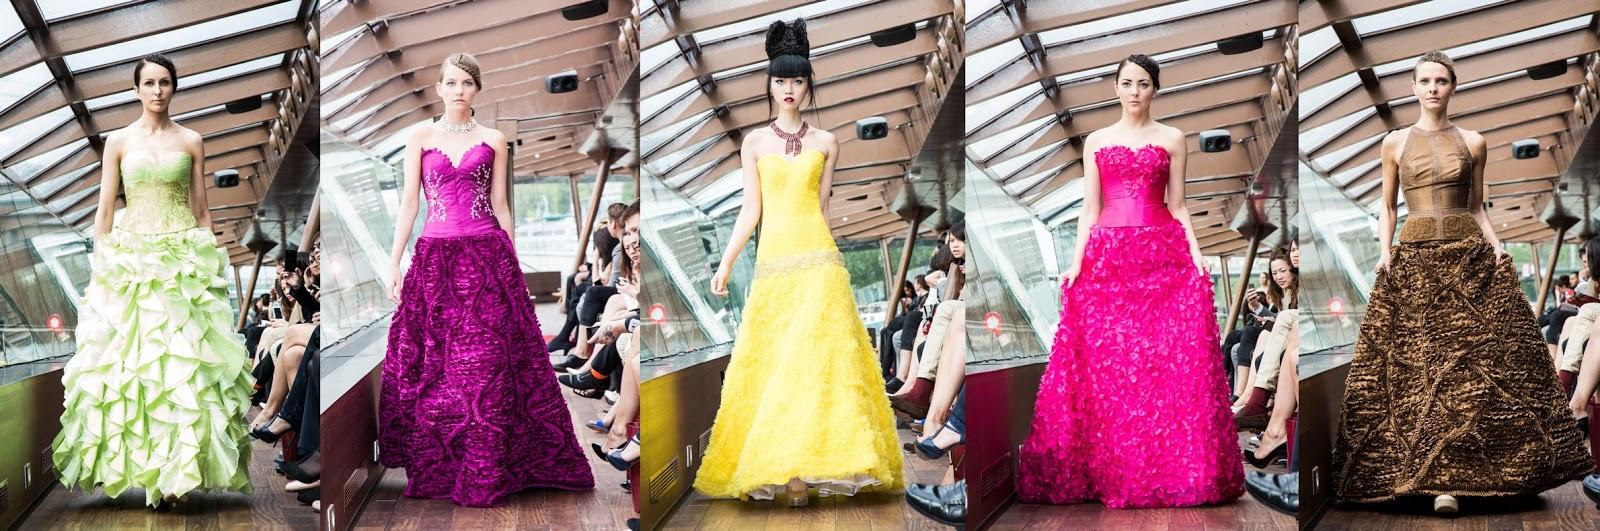 WTFSG-j-summer-fashion-show-on-river-seine-paris-3